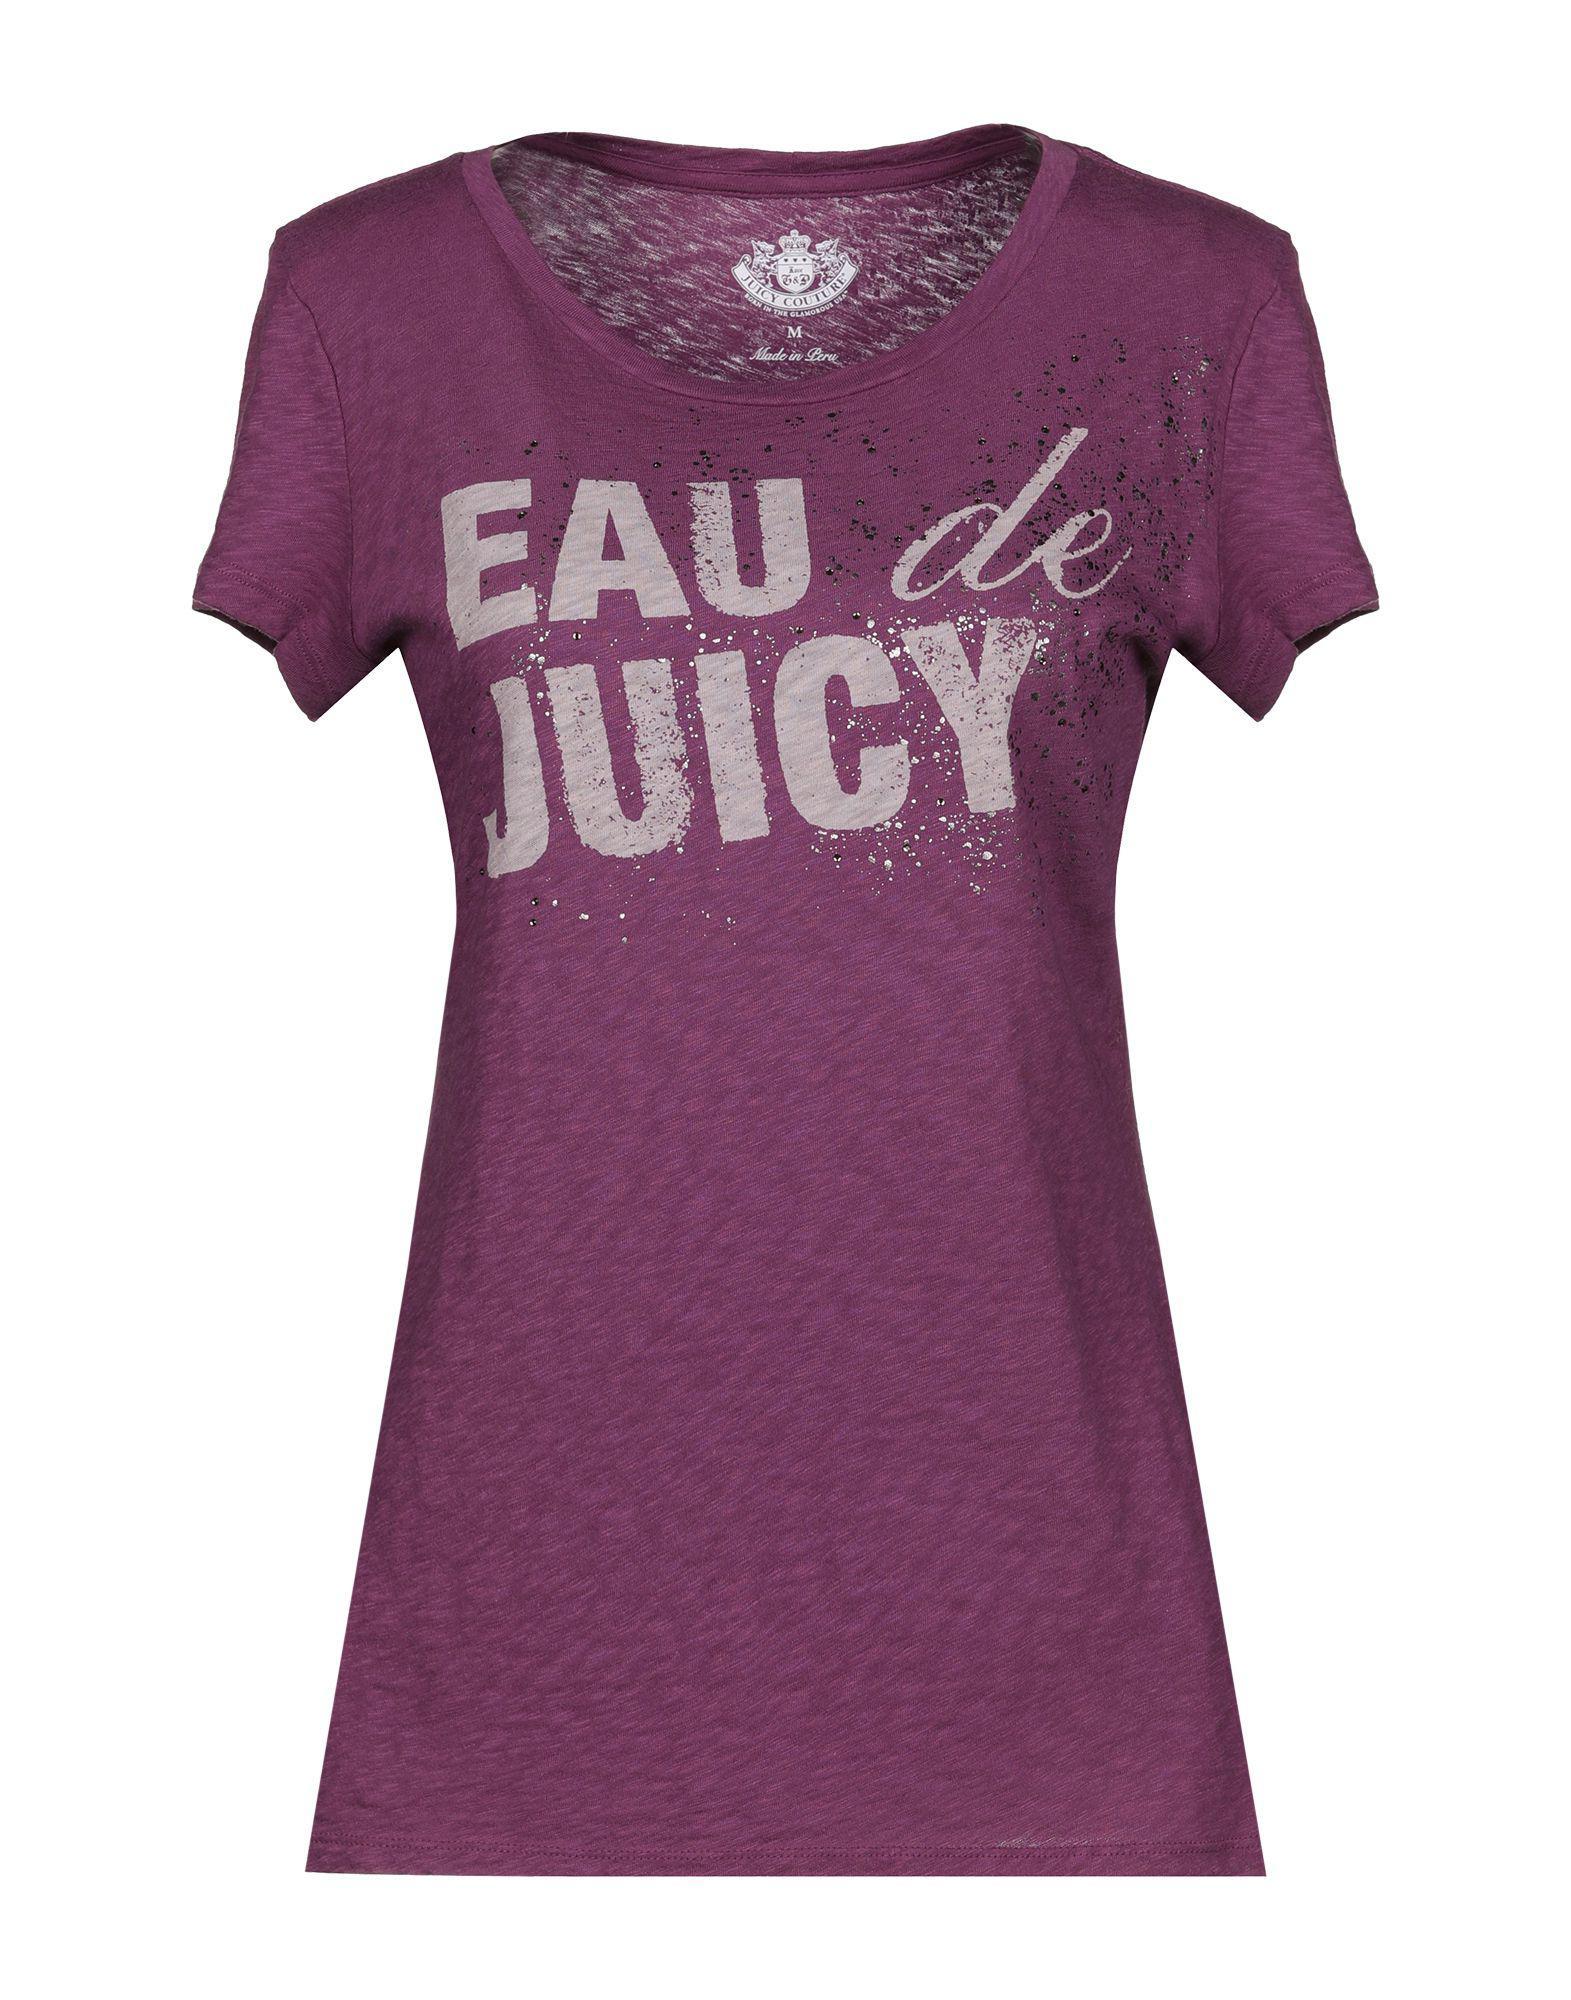 e45c9ca4beca Juicy Couture T-shirt in Purple - Lyst